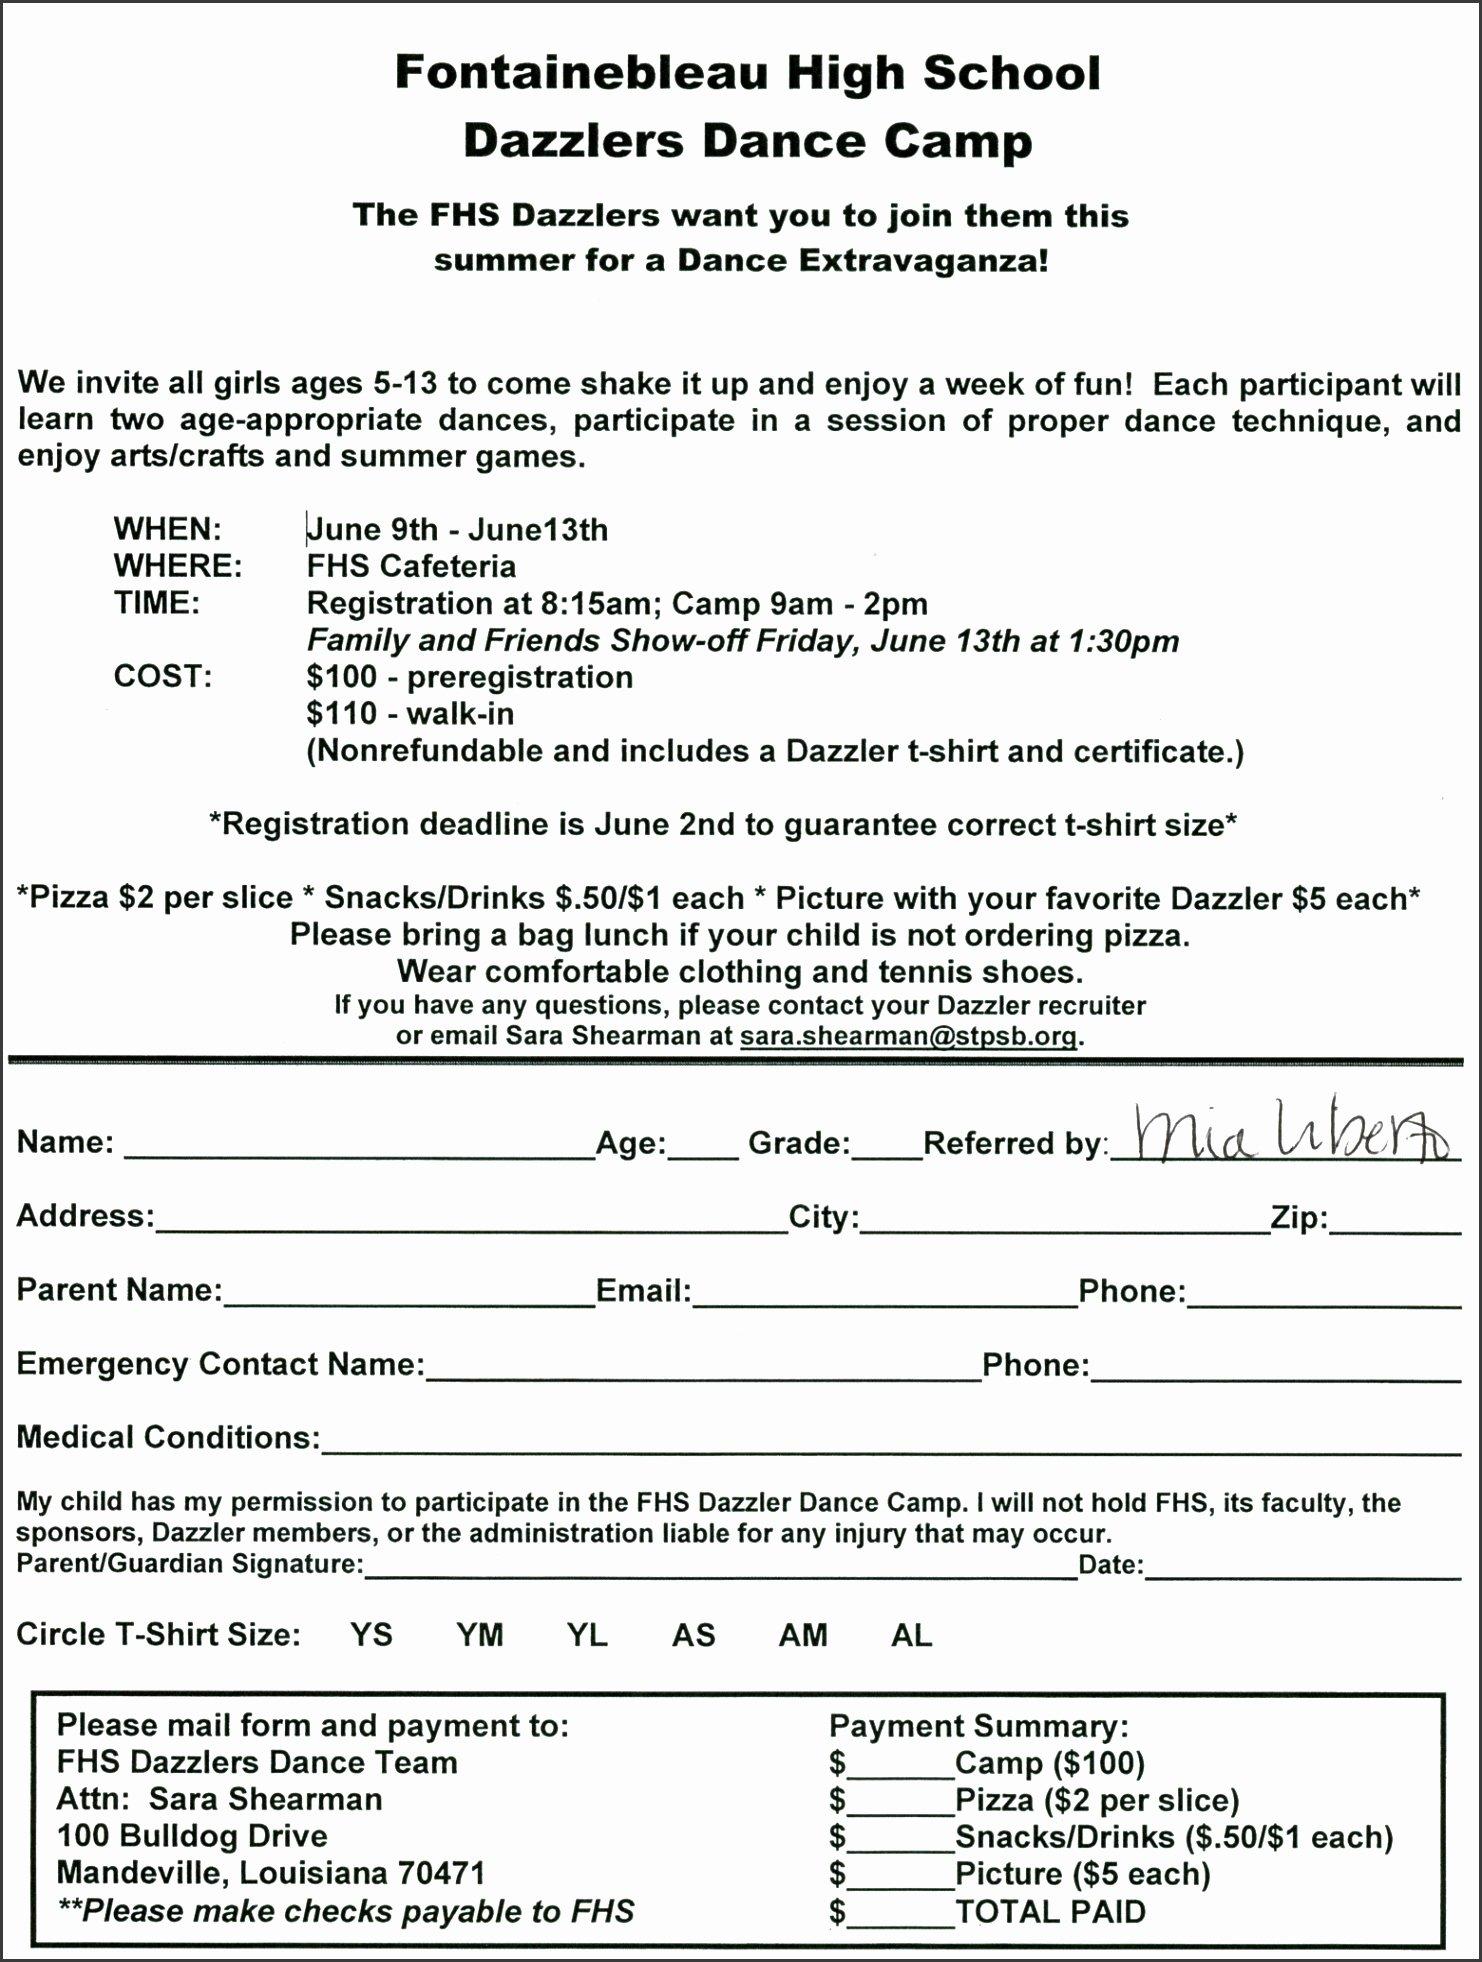 Free Summer Camp Registration form Template Awesome 10 Church Camp Registration form Template